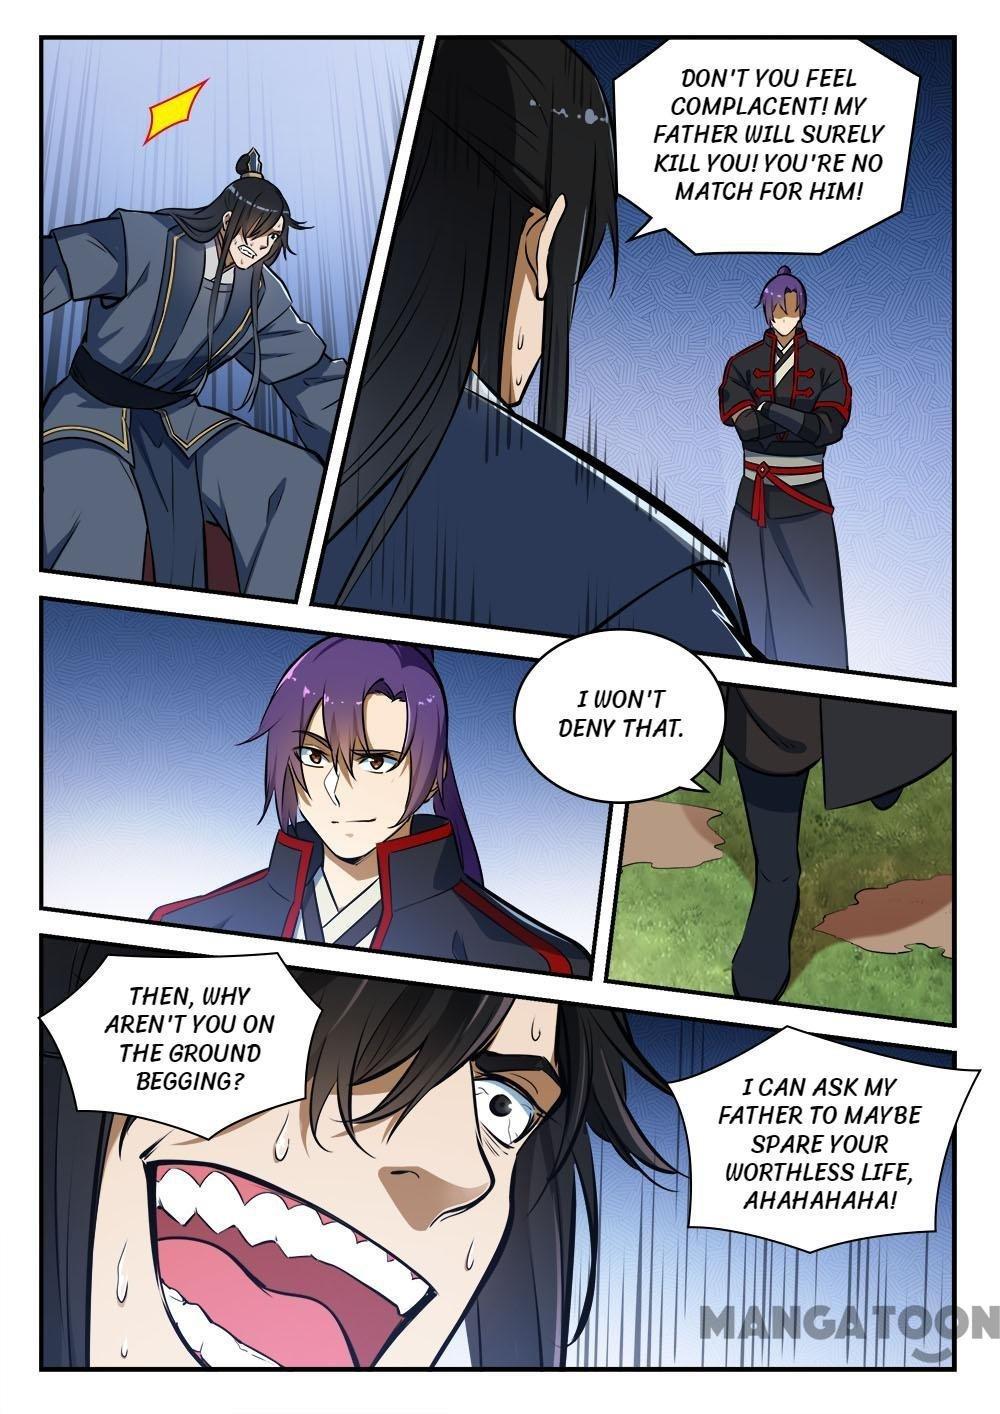 Manga Apotheosis - Chapter 419 Page 3